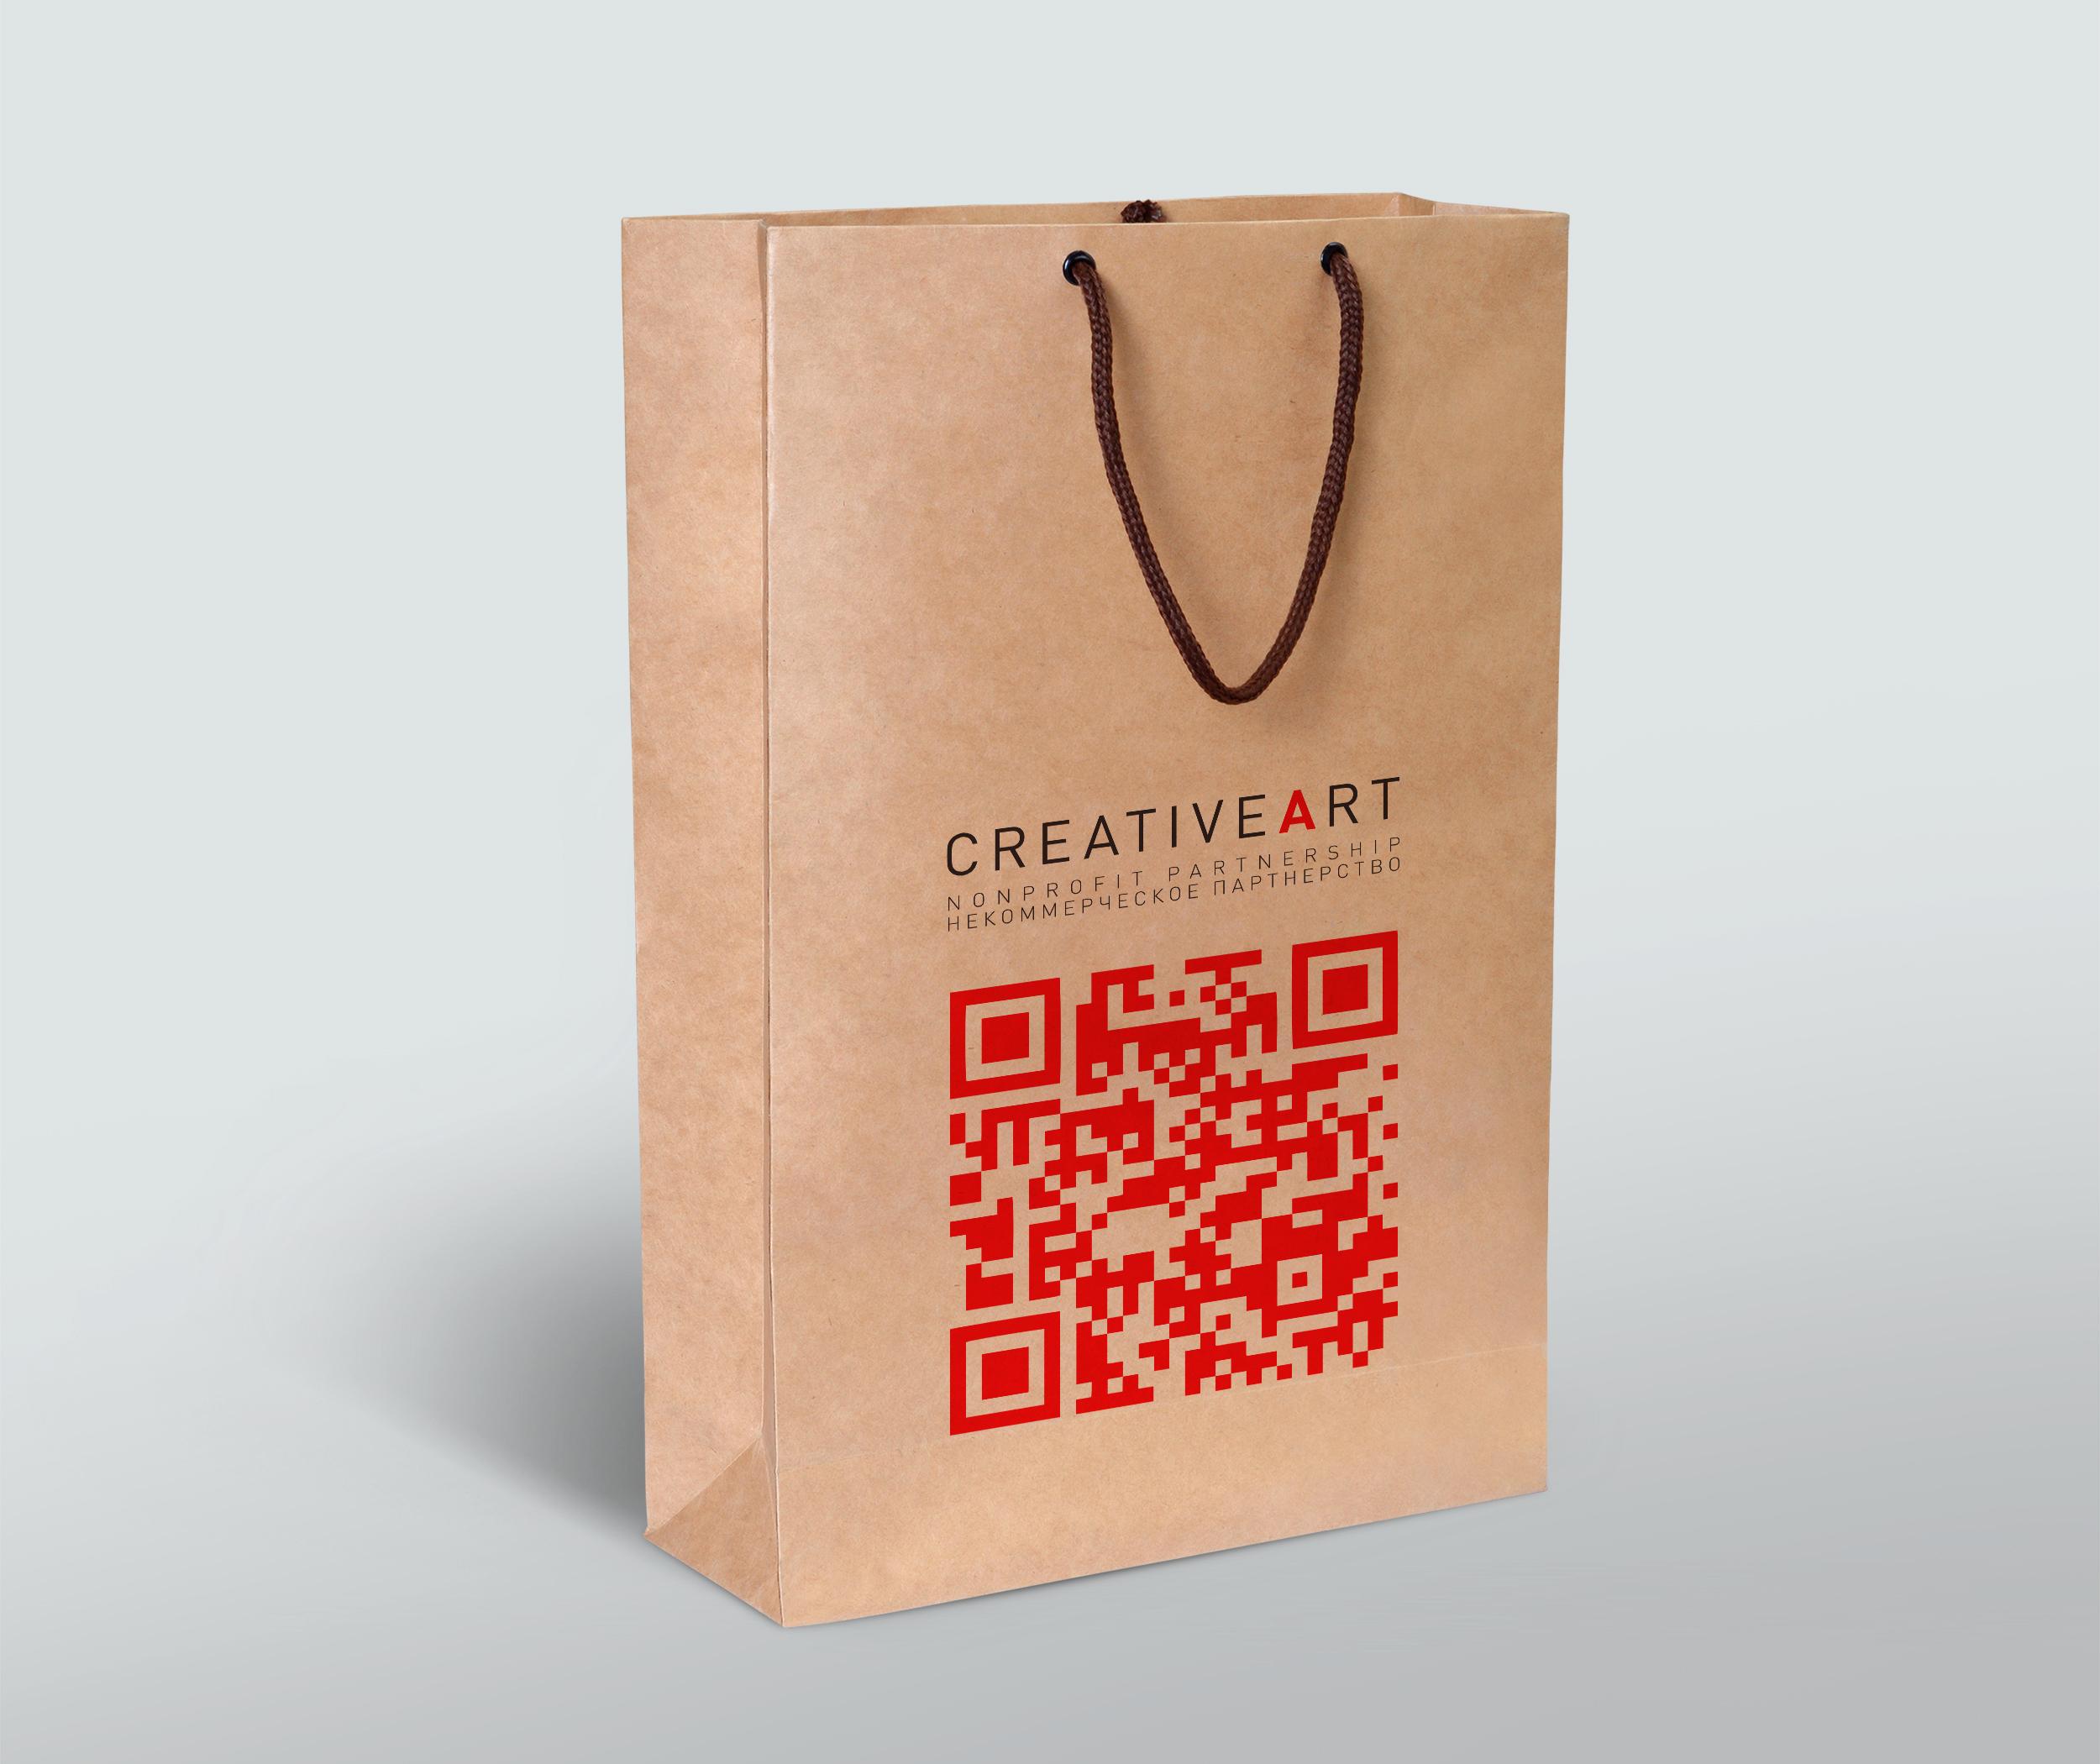 CreativeArt Bag